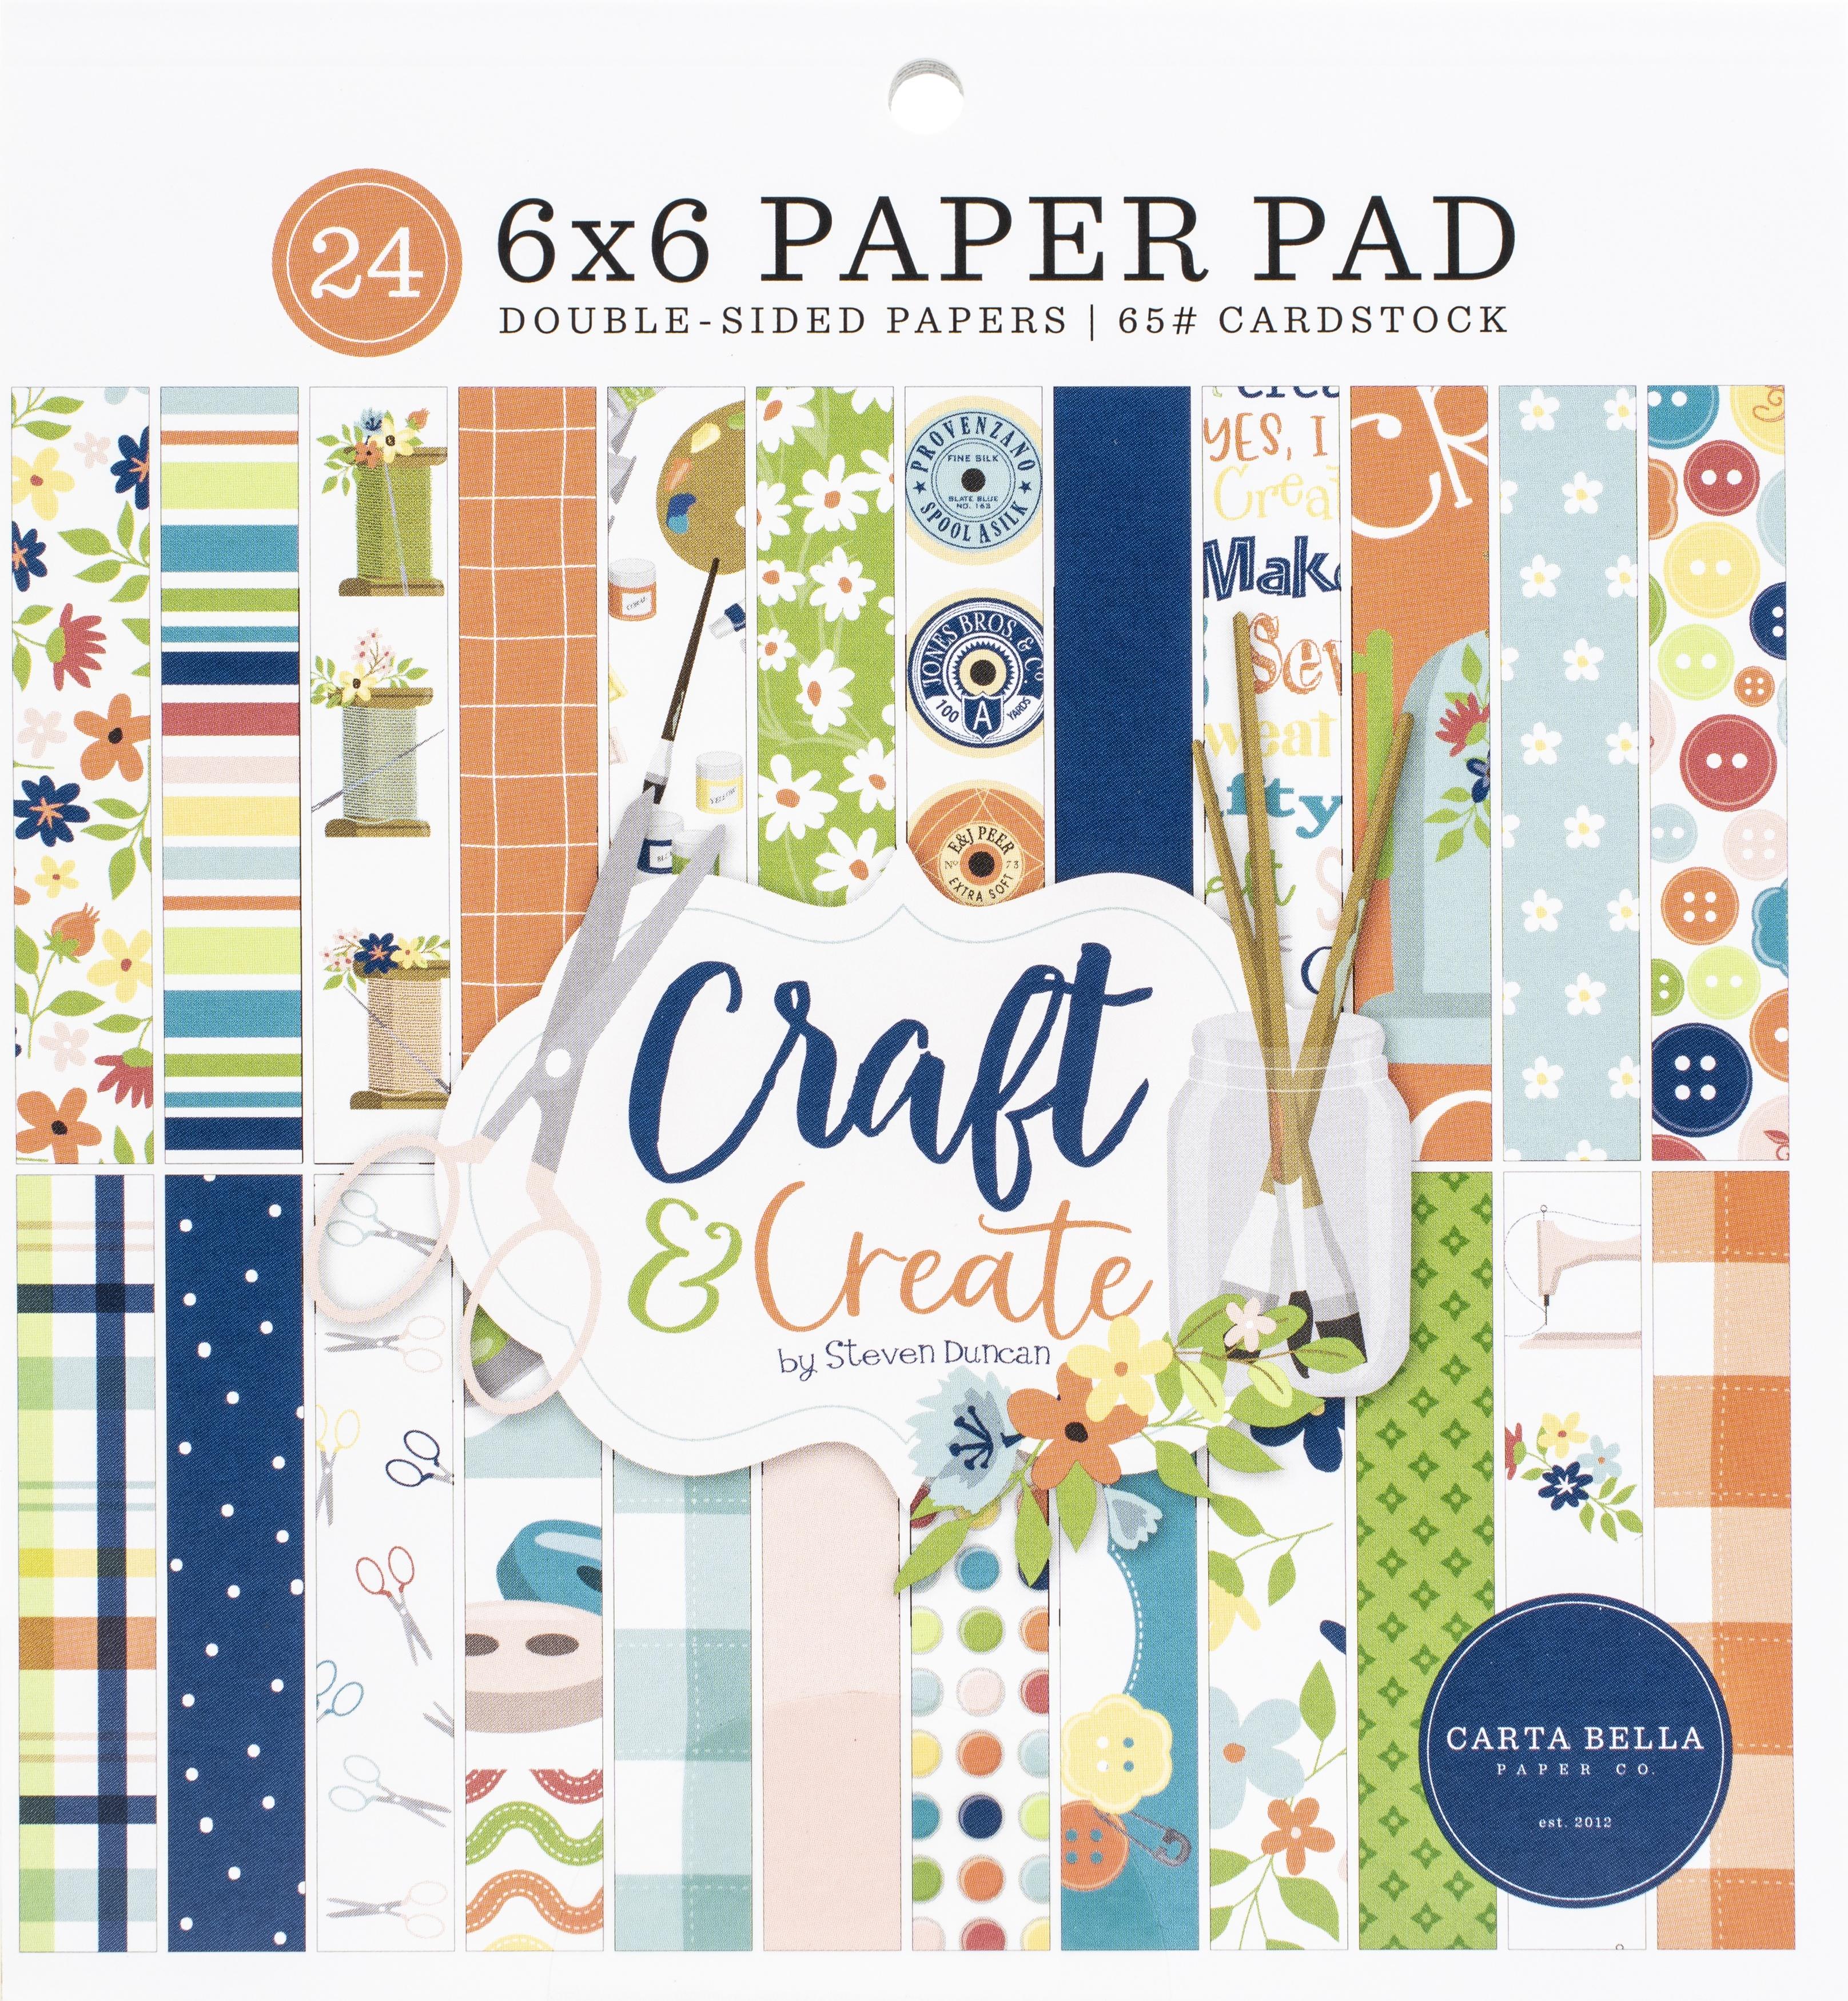 Carta Bella Double-Sided Paper Pad 6X6 24/Pkg-Craft & Create